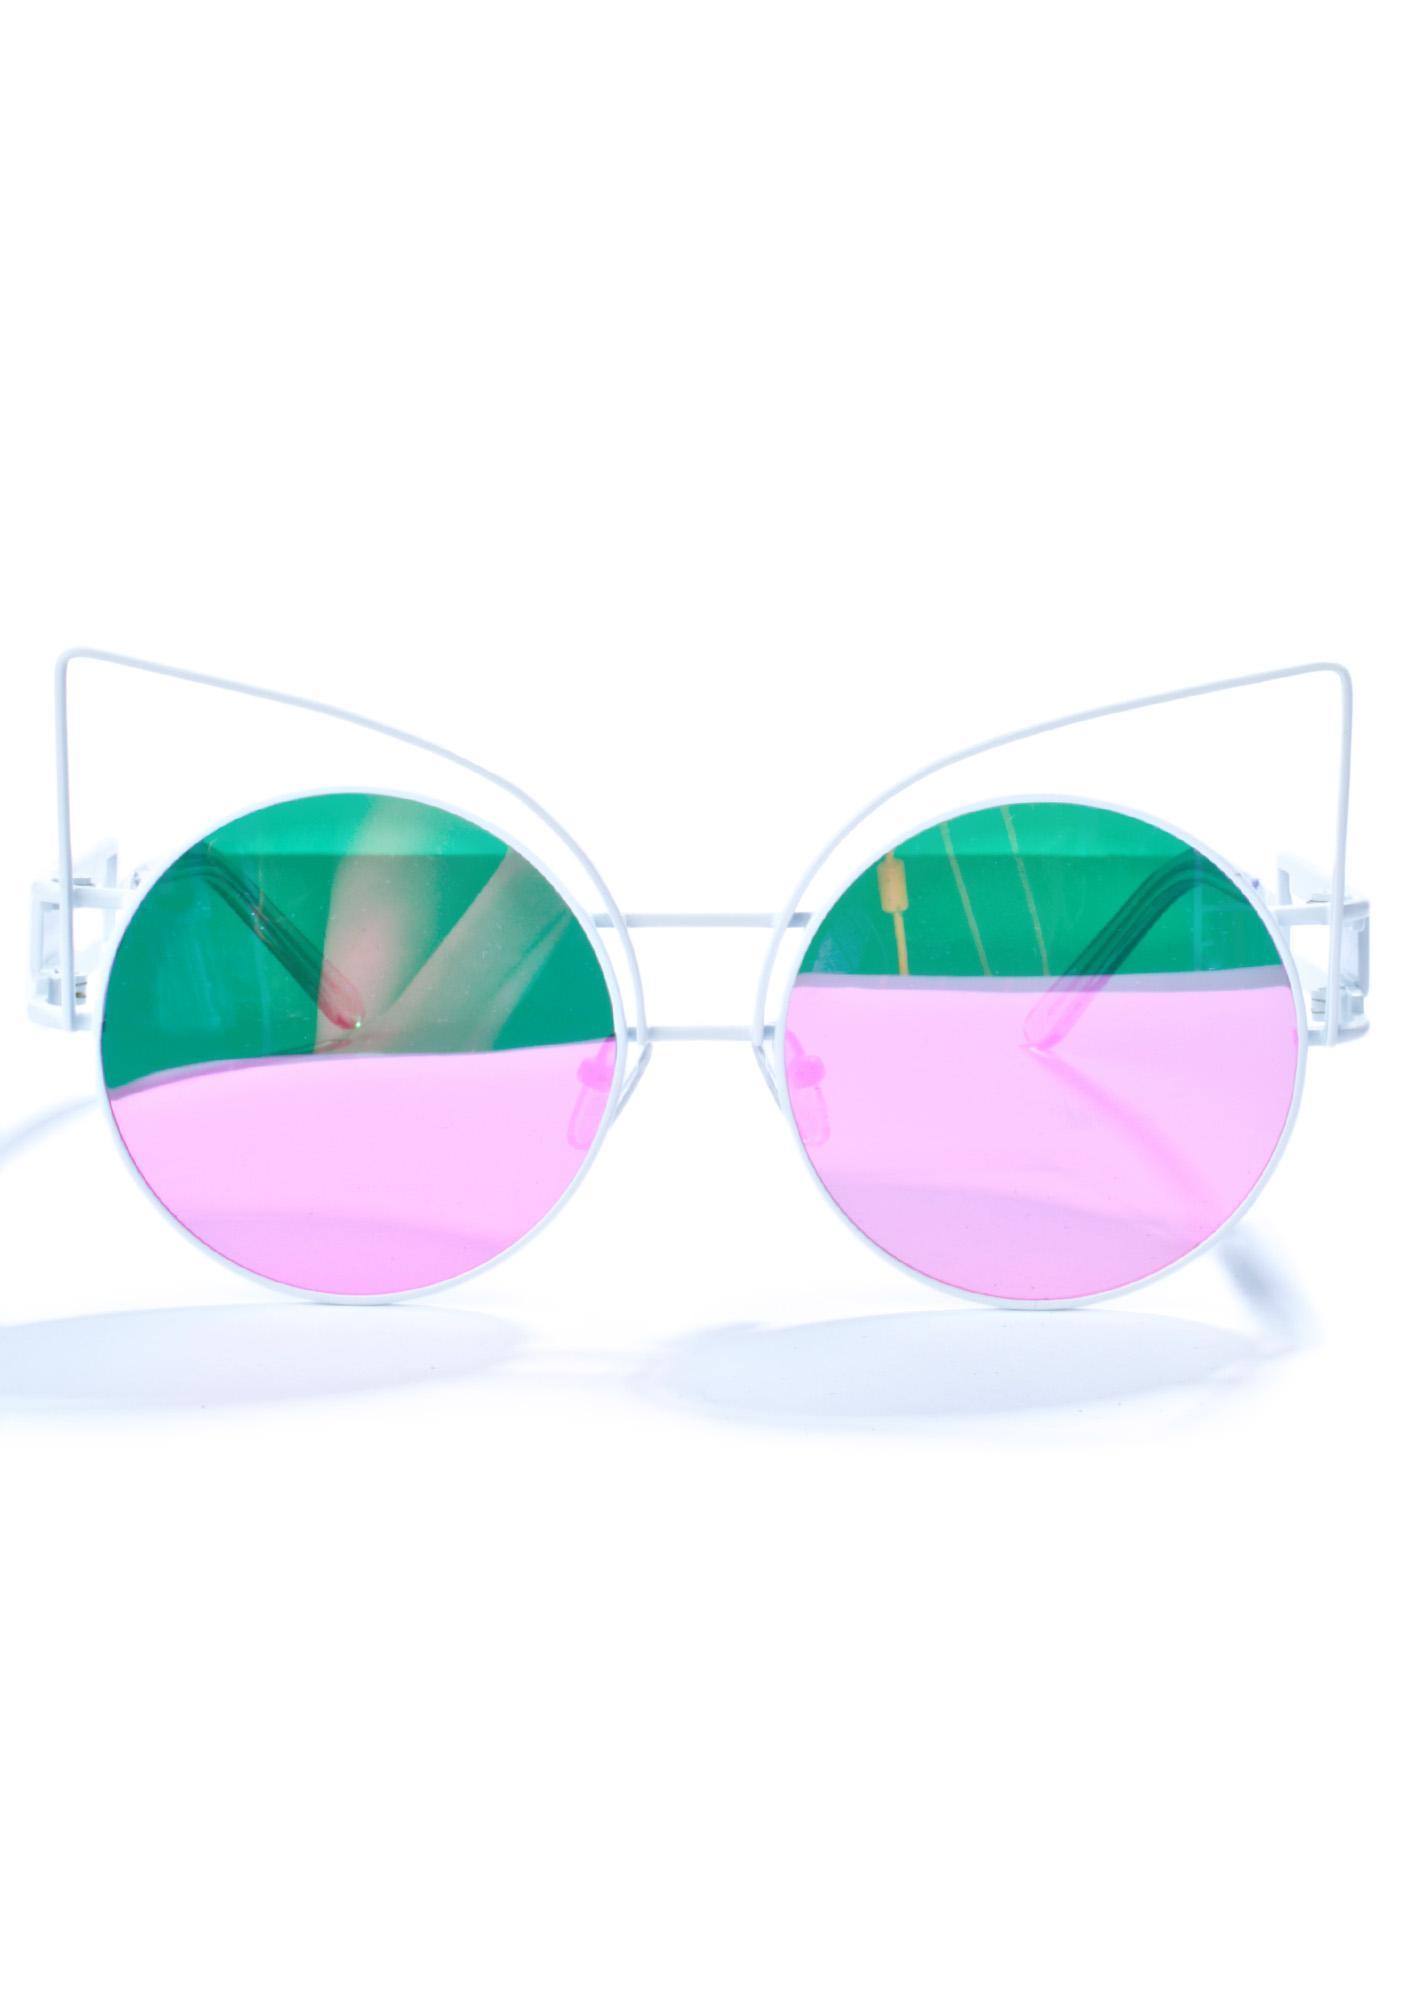 ESQAPE Feline Sunglasses